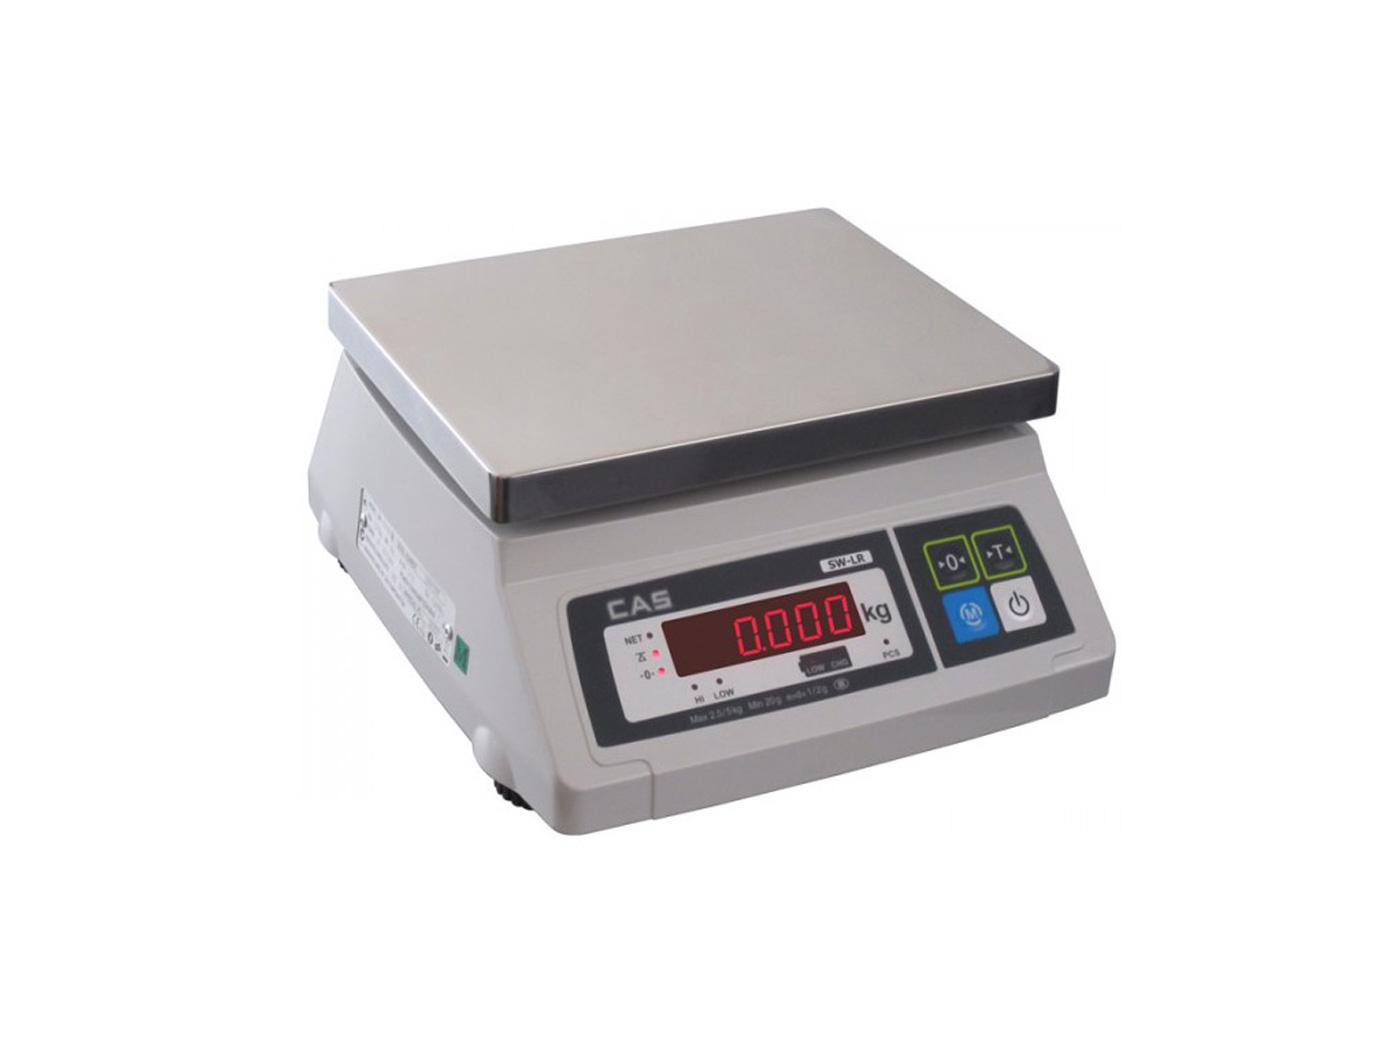 CAS SW LR Basic Scale